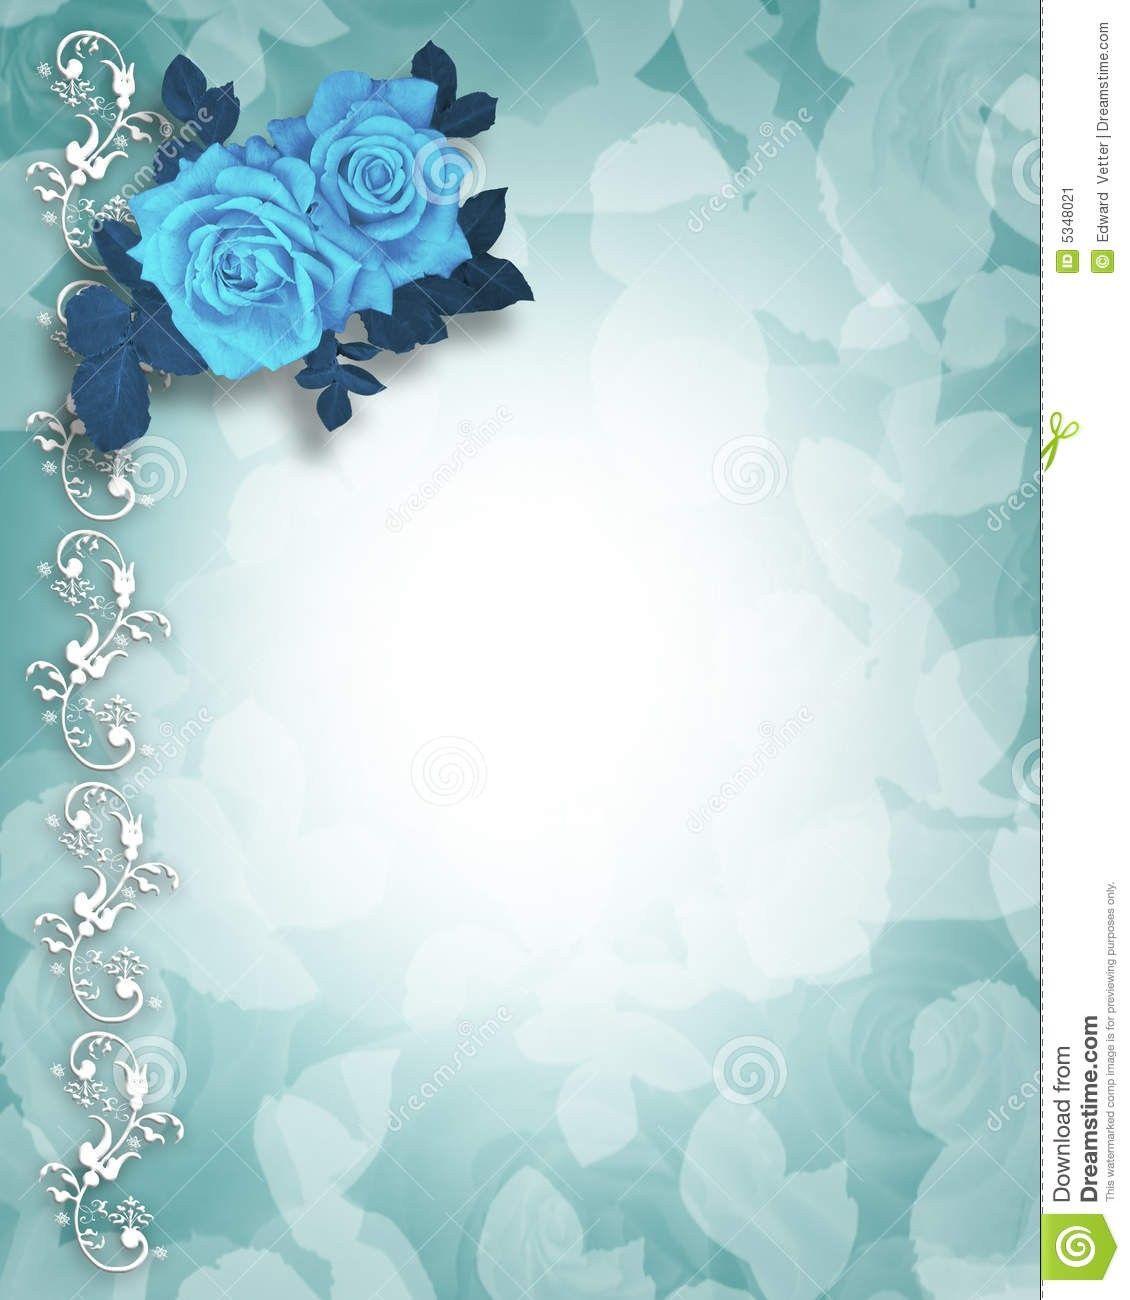 royal blue blank wedding invitation background